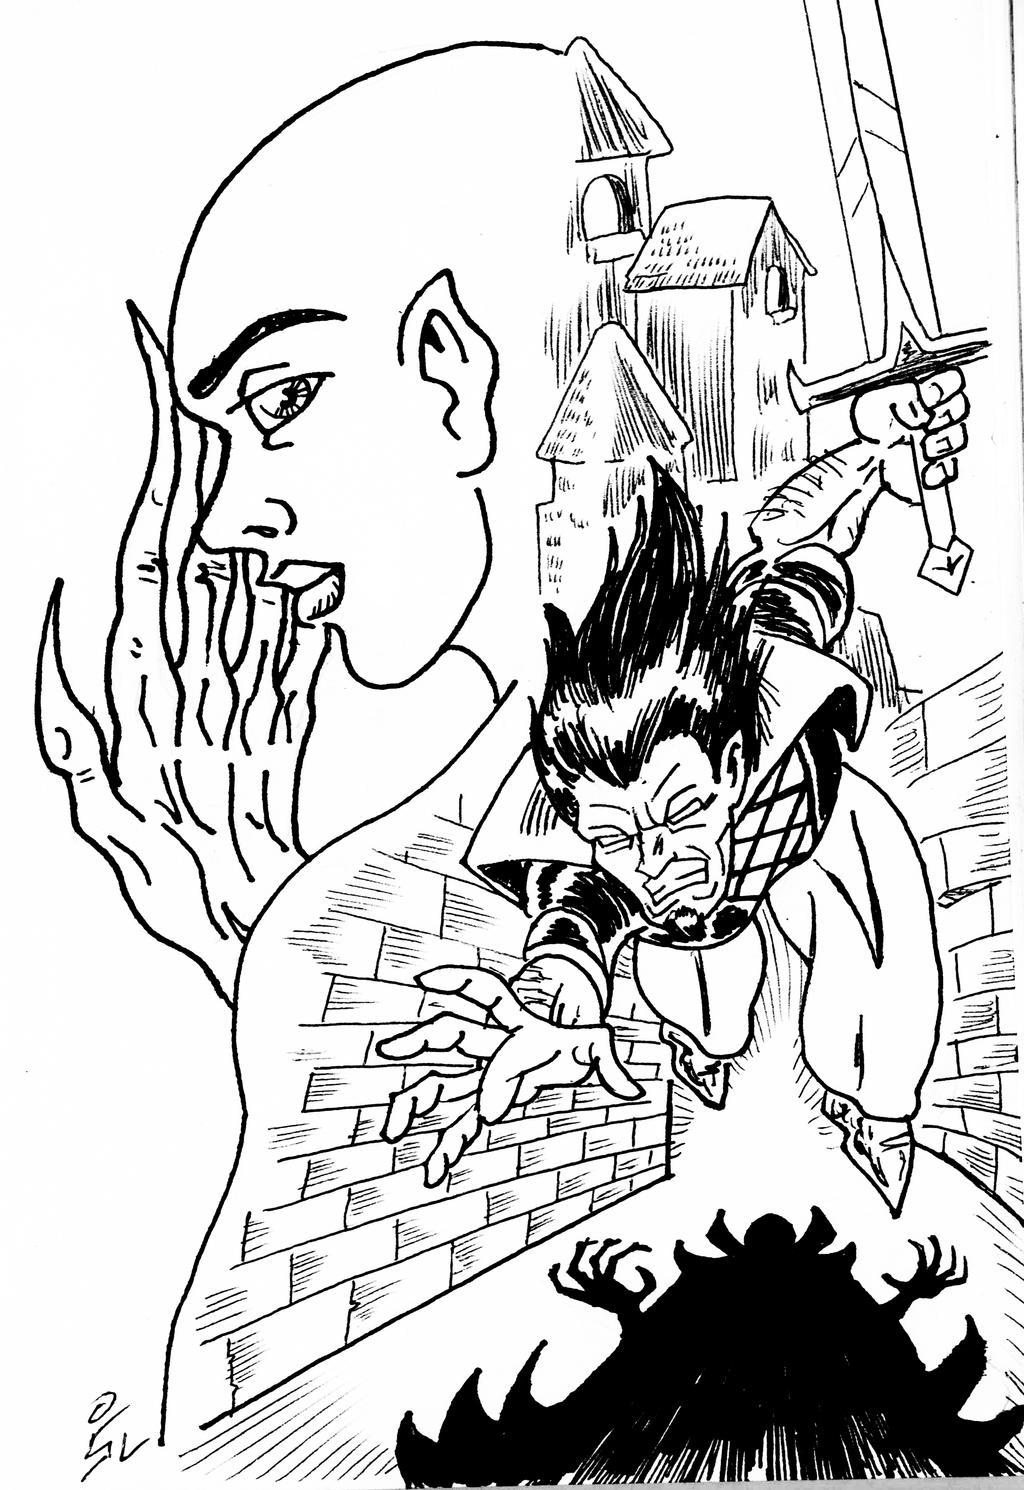 morbius by mrpulp-presenta